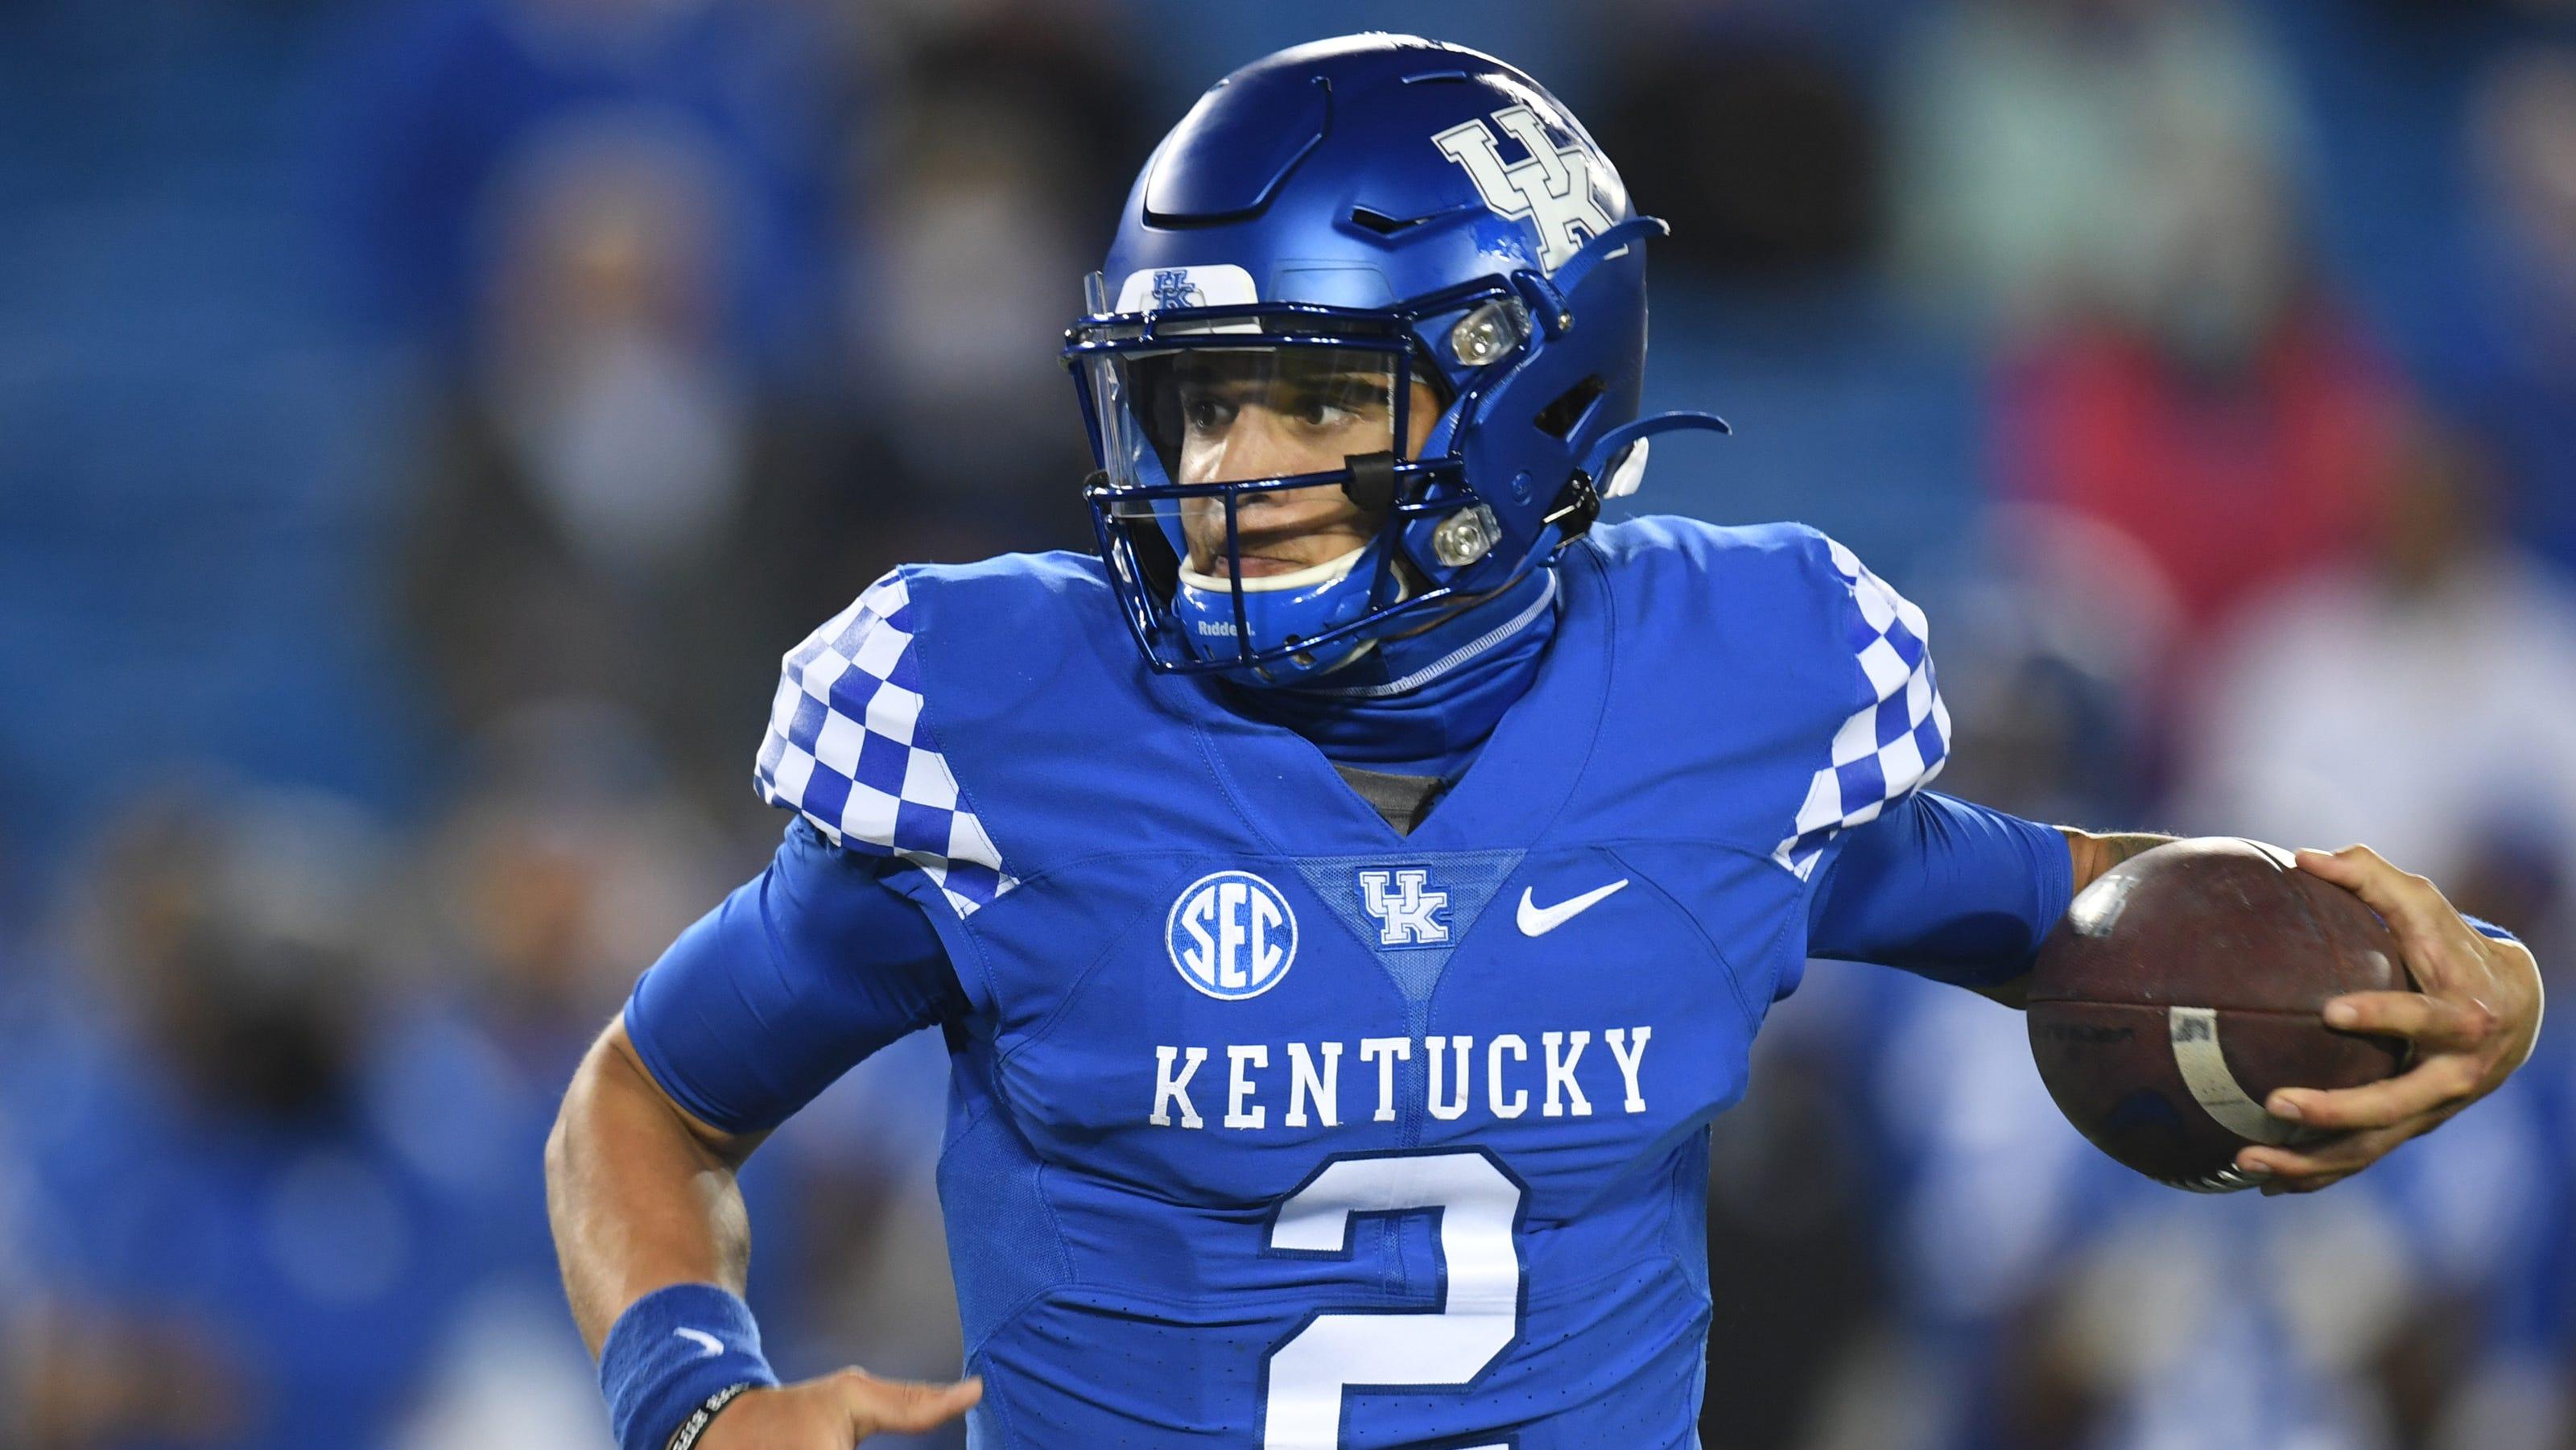 Kentucky football: Joey Gatewood could start vs. Georgia